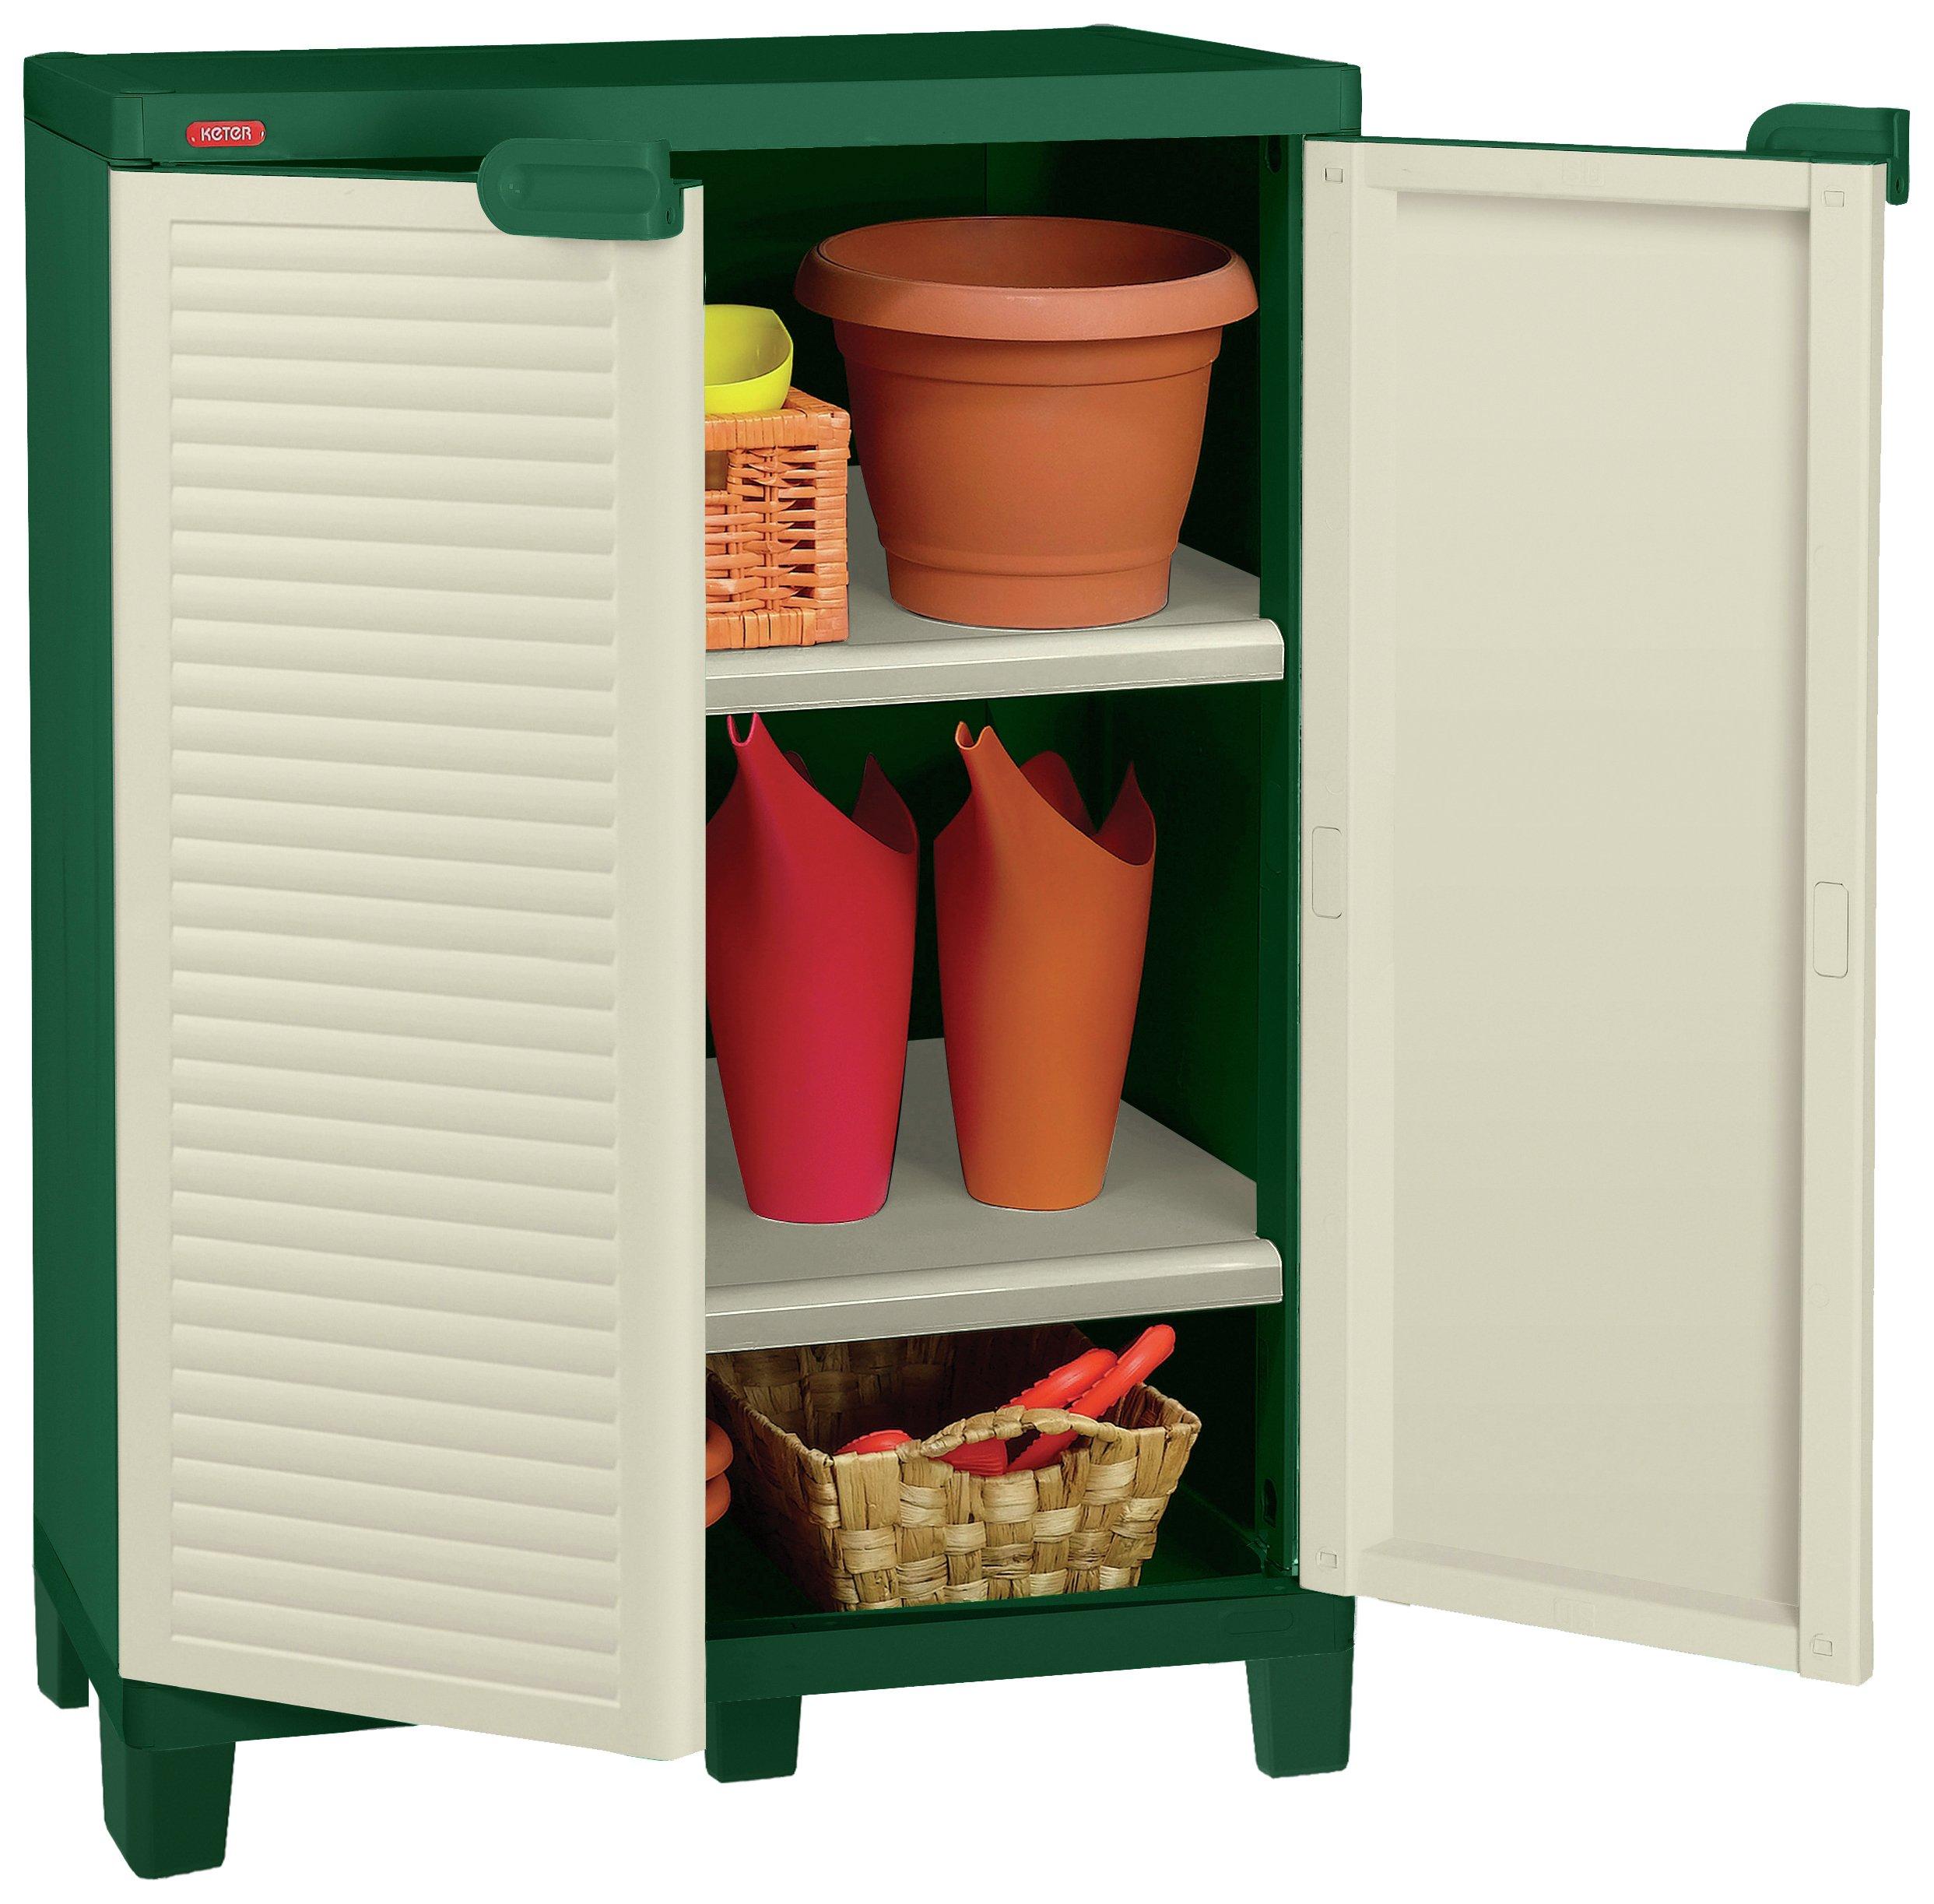 Keter Utility Compact Storage Cupboard - Cream & Argos | 338 | Compare Online 247